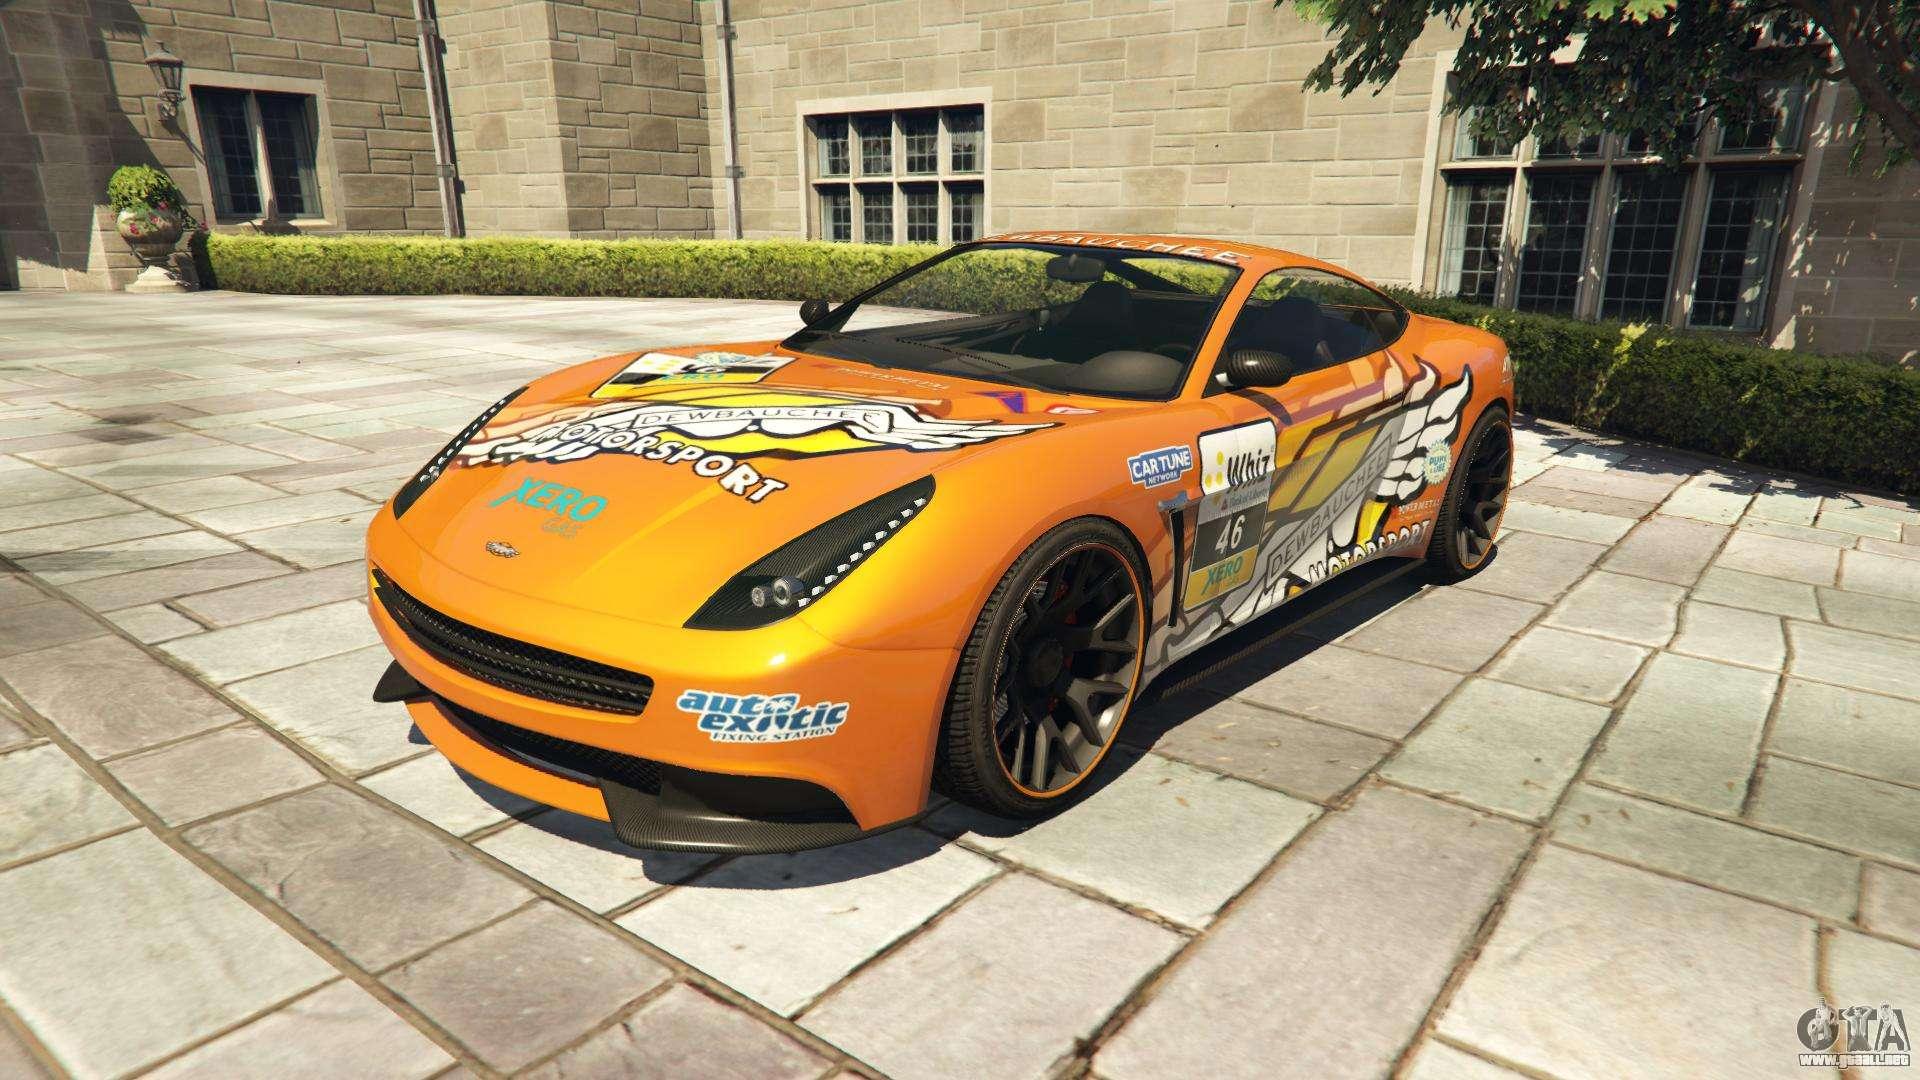 Dewbauchee Massacro Racecar de GTA 5 - las capturas de ...